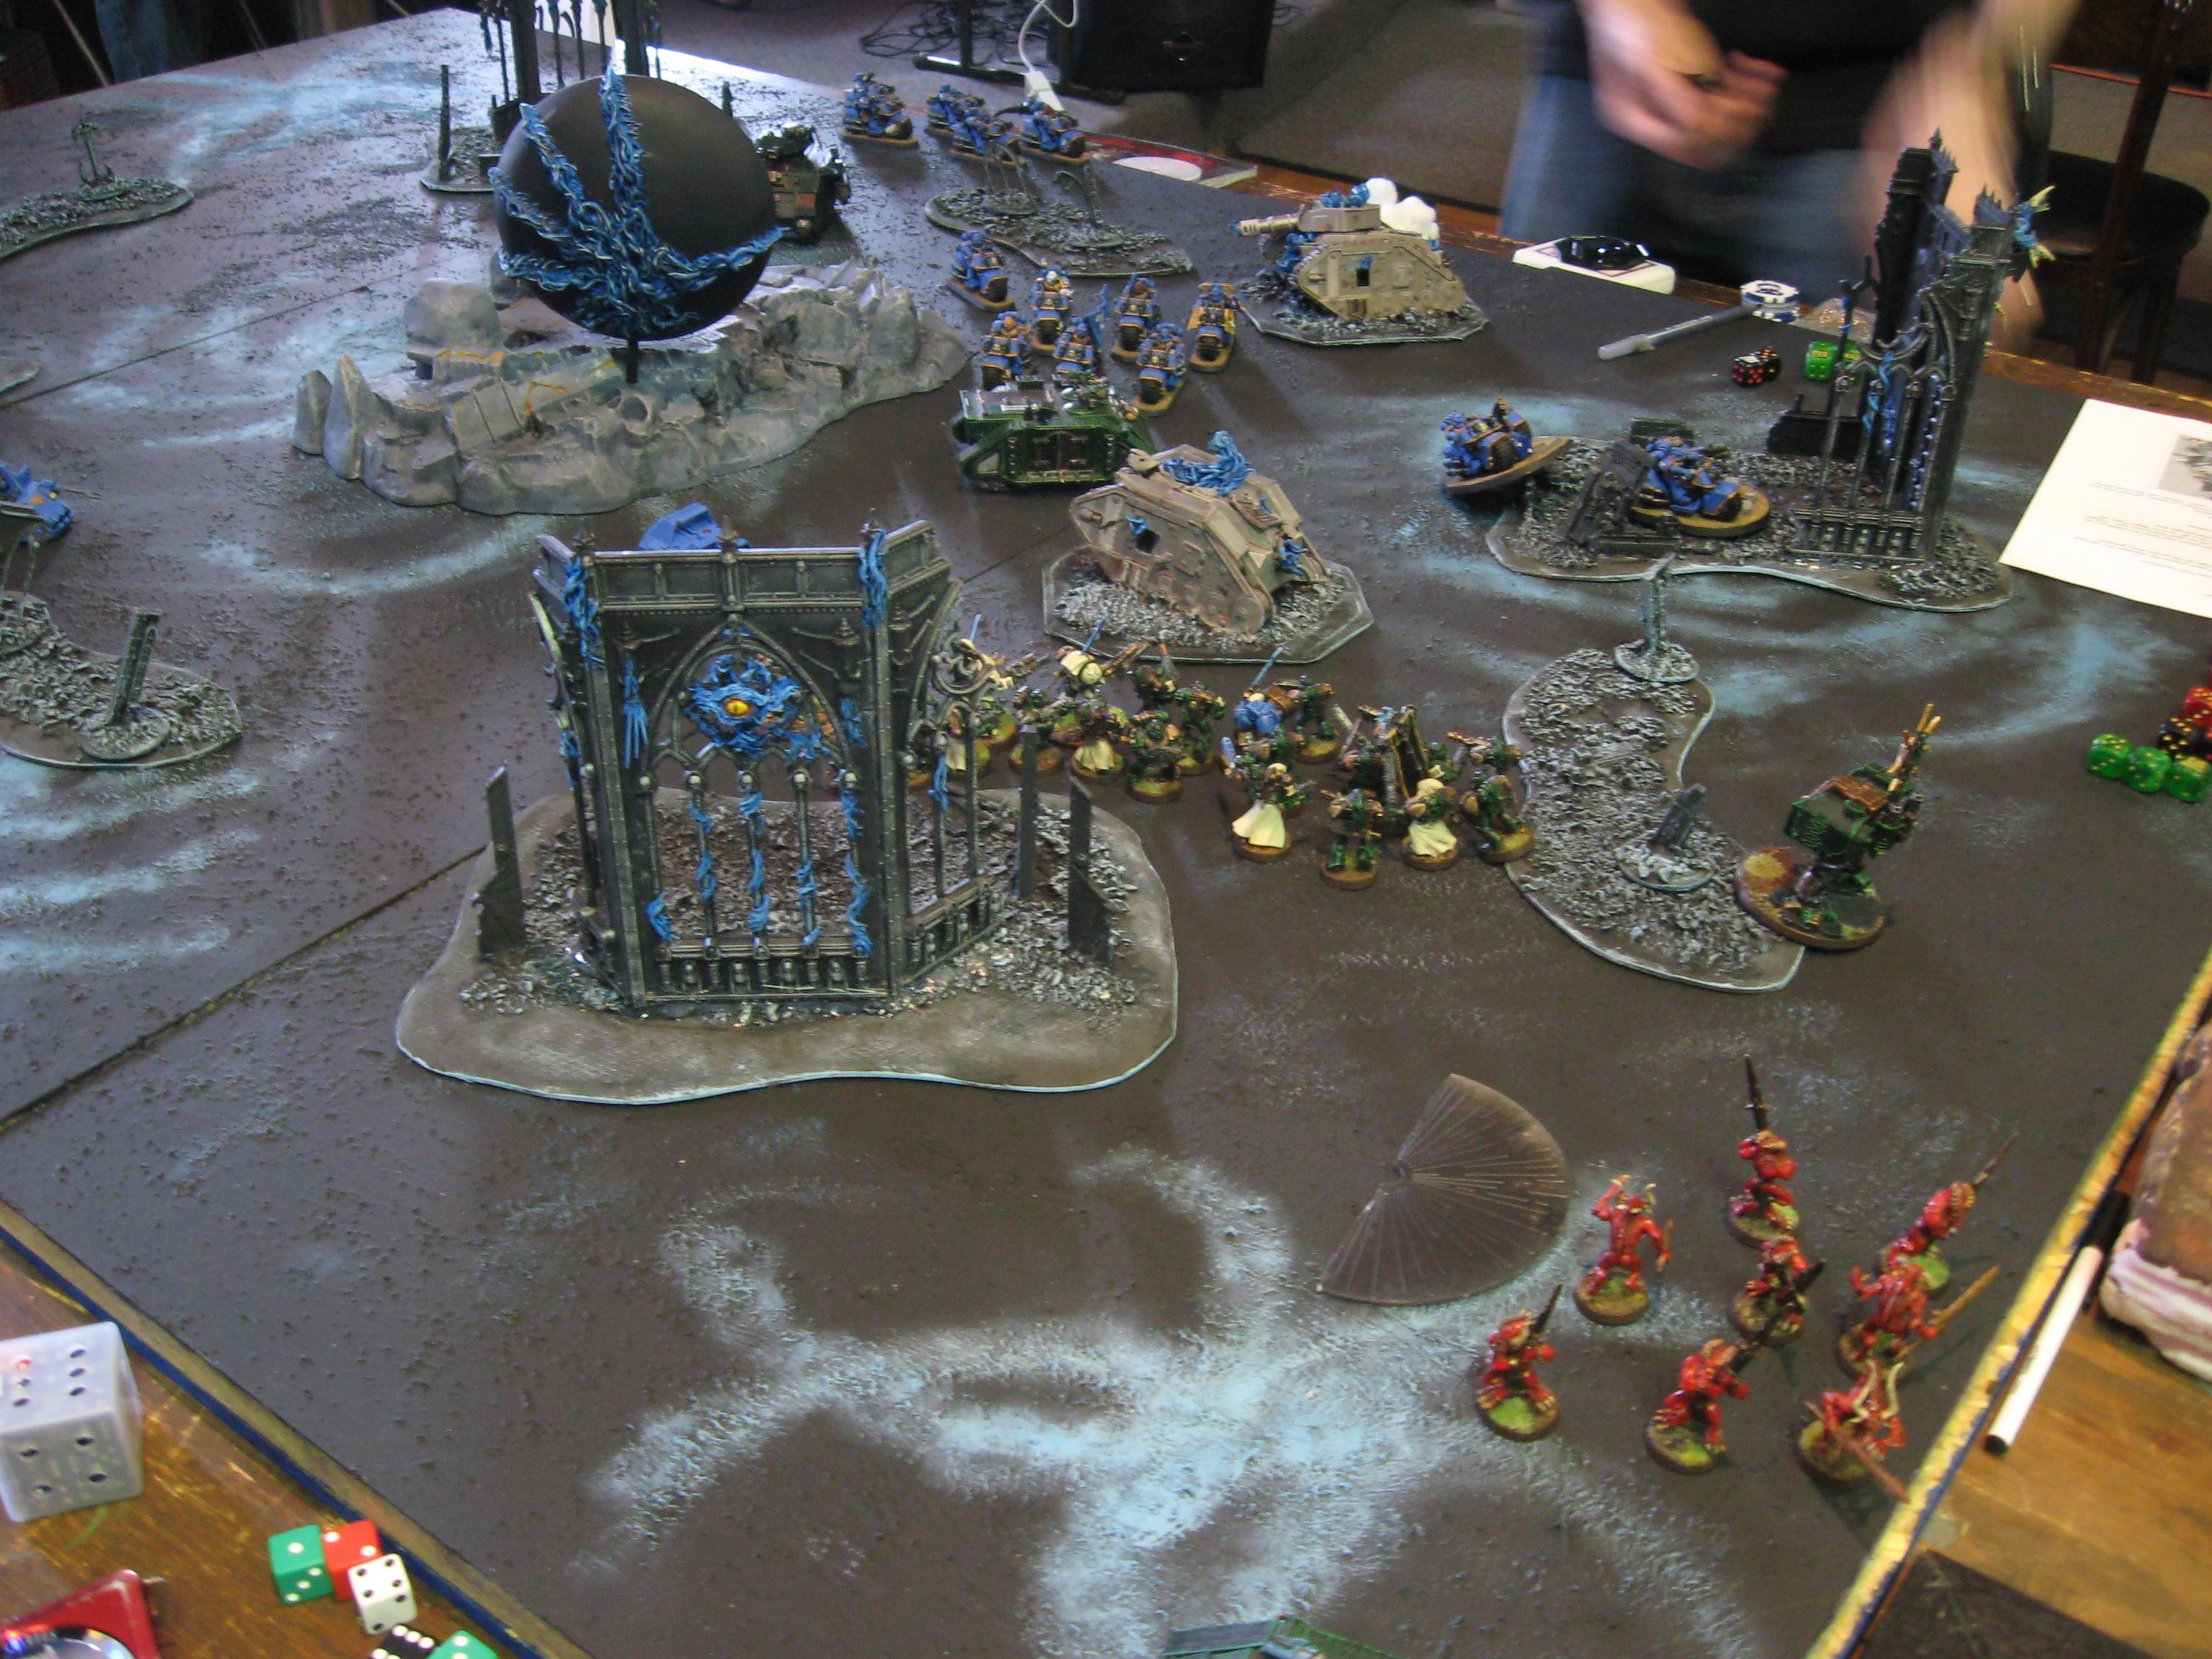 Chaos Daemons, Daemons, Daemonworld, Game Table, Space Marines, Terrain, Warhammer 40,000